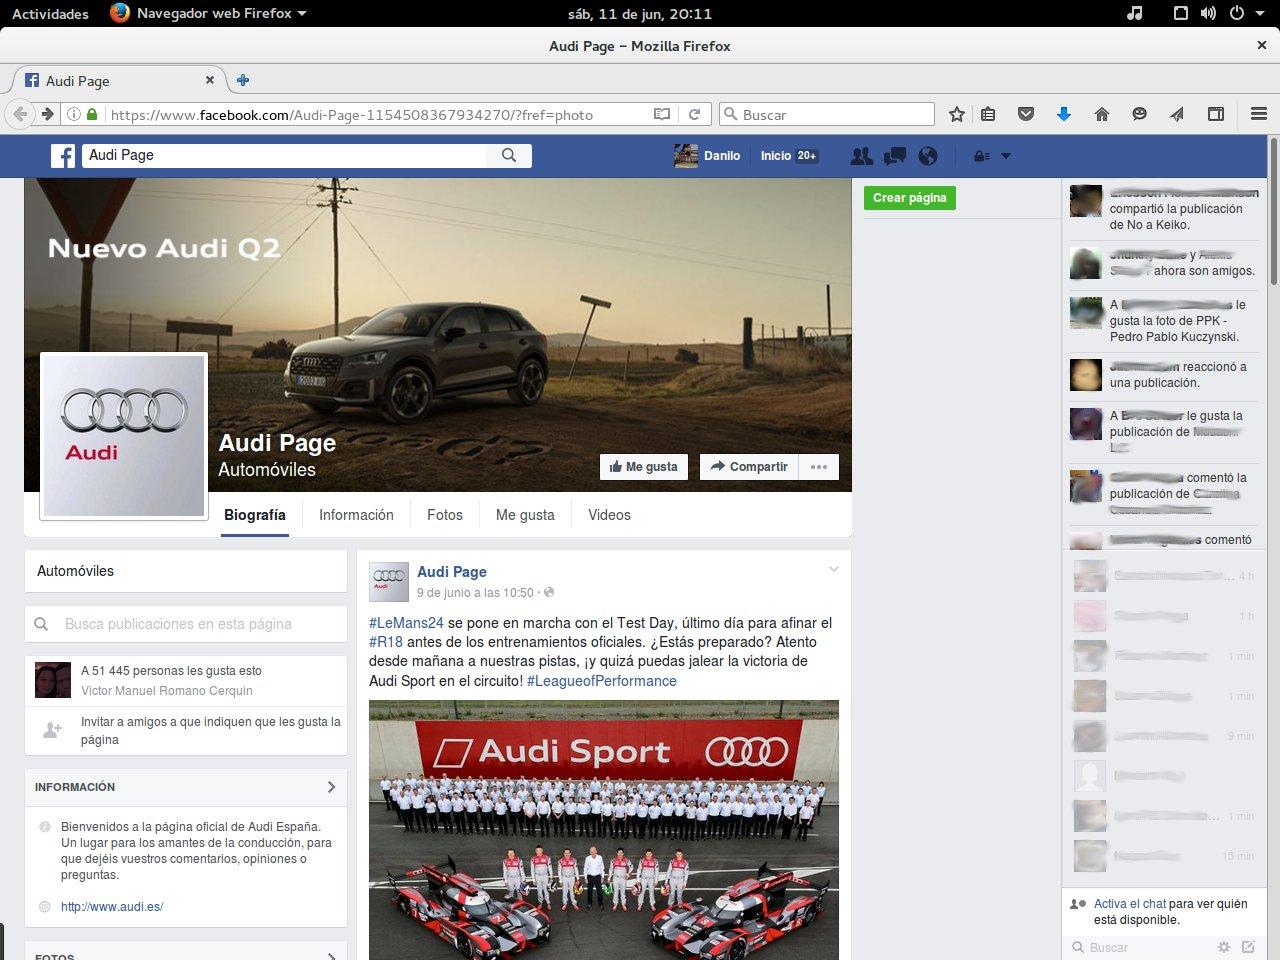 página de Facebook de Audi España (falsa)